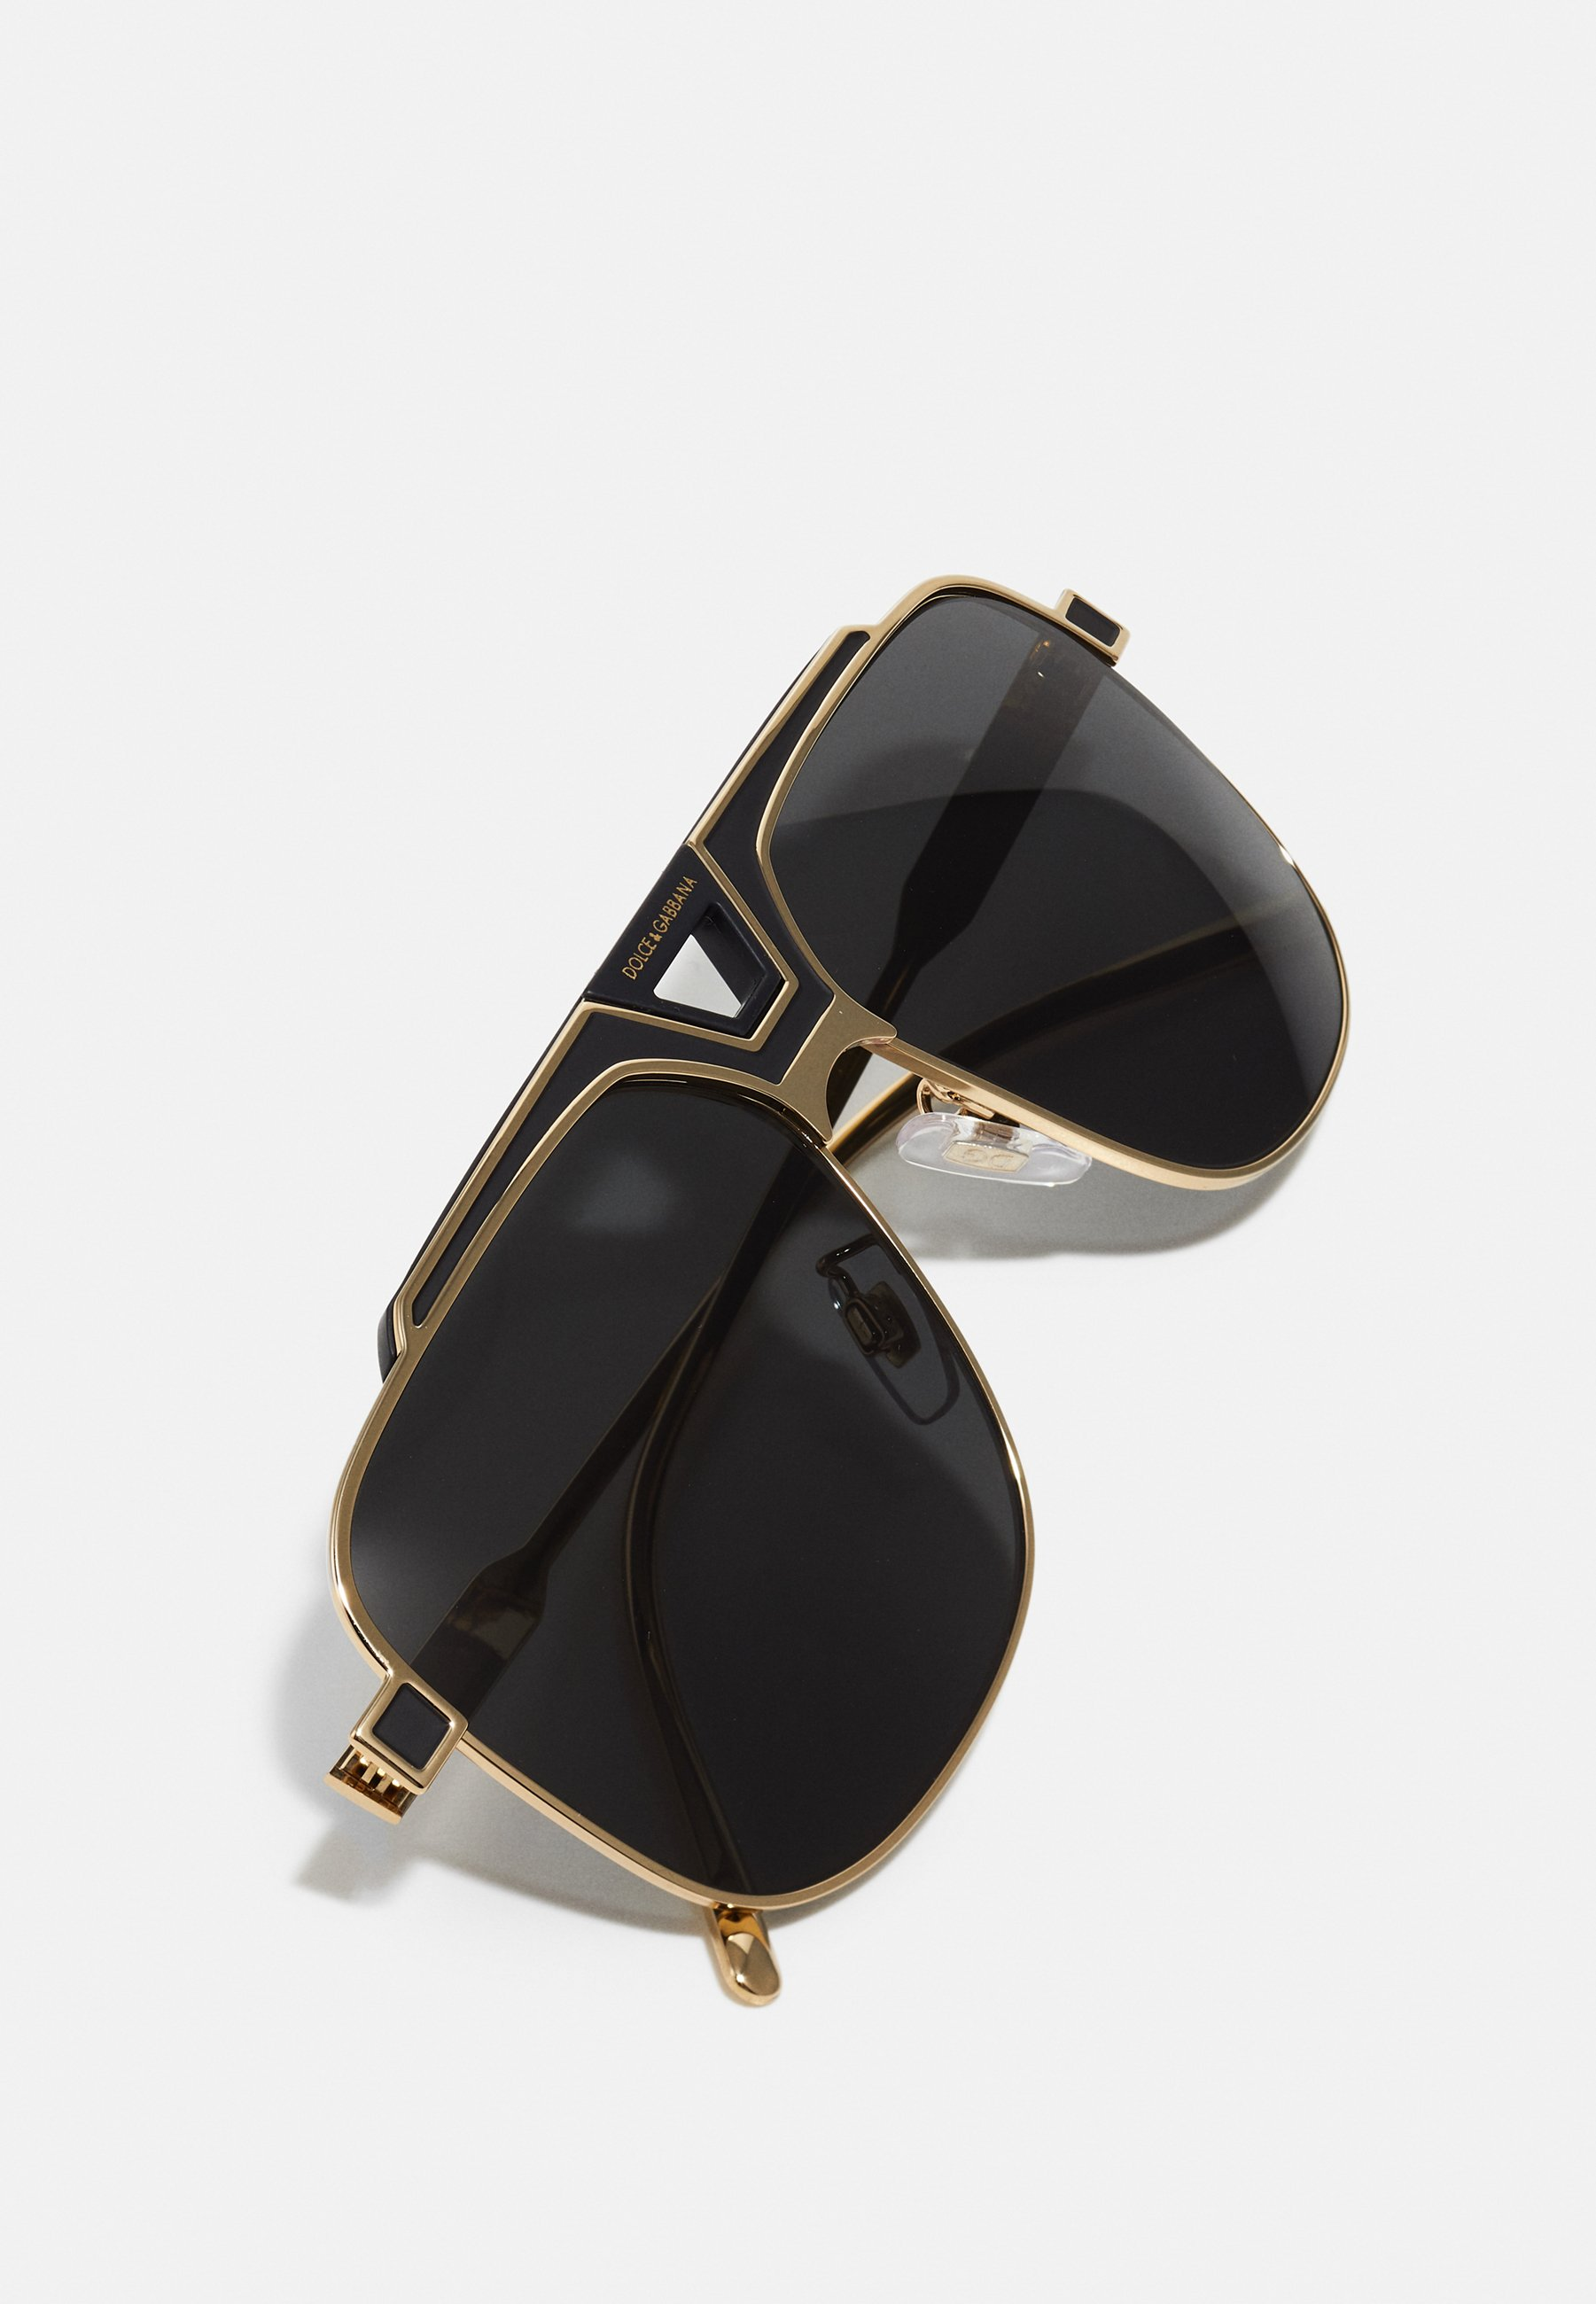 Dolce&Gabbana Solbriller - gold-coloured/black matte/gull qxfNBYLKTPY6TeX